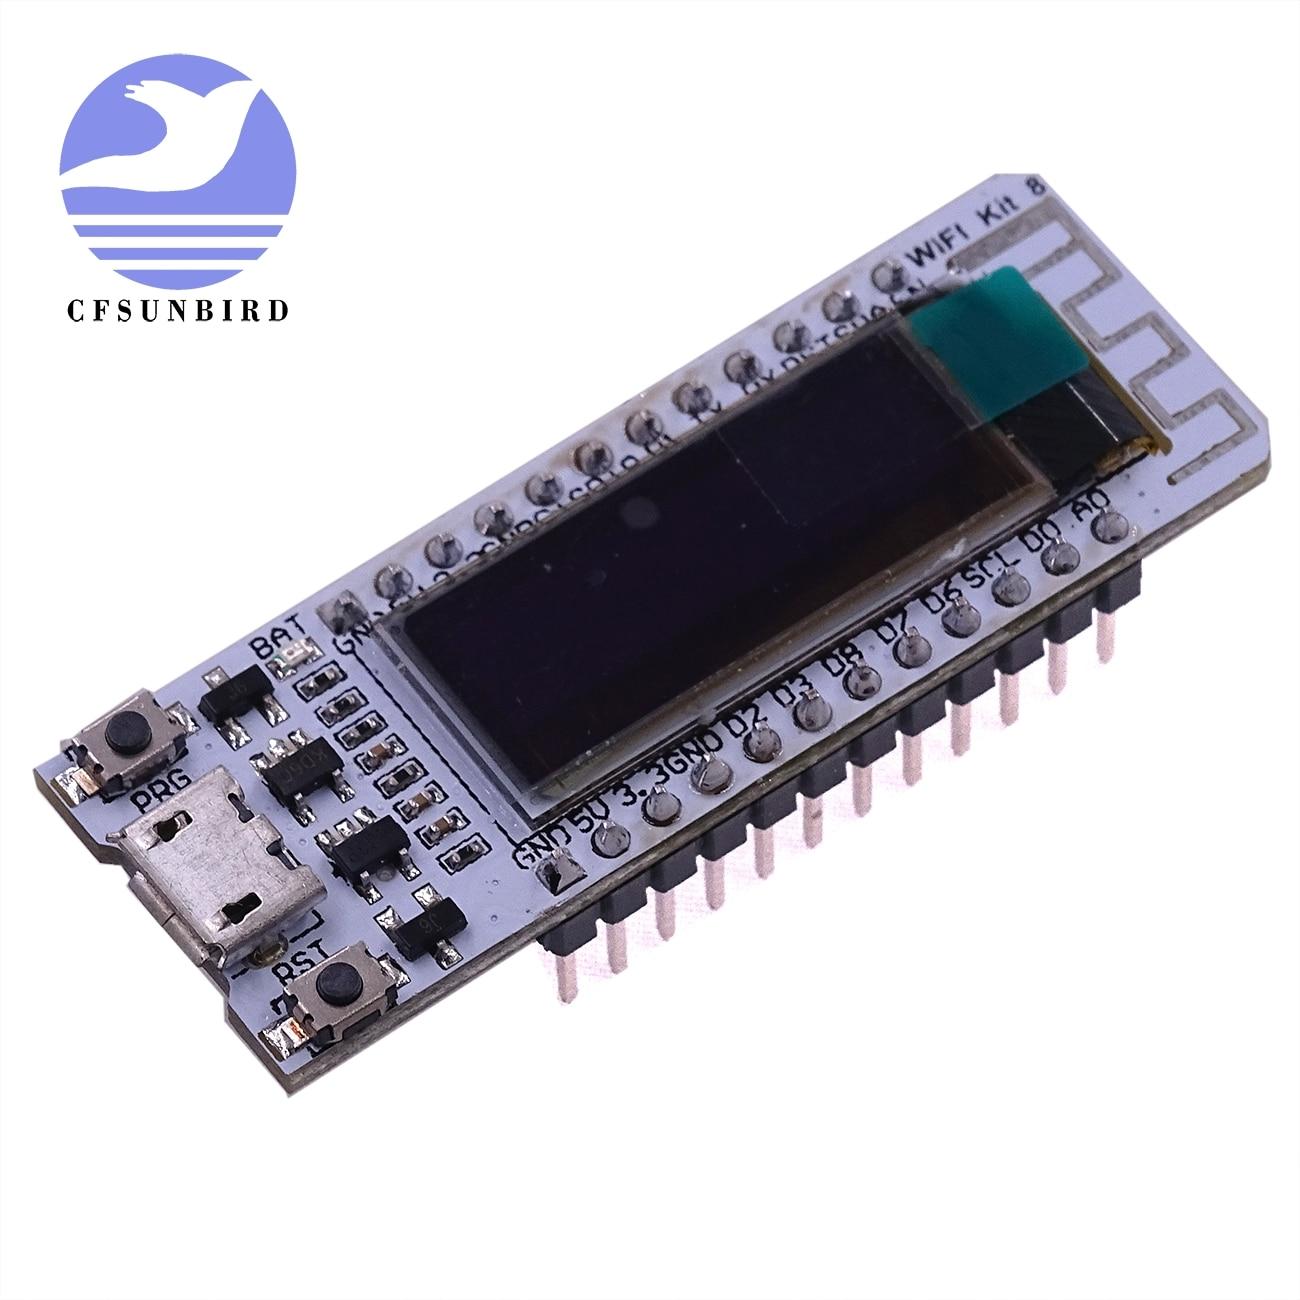 CFsunbird ESP8266 Chip WIFI 0,91 pulgadas OLED CP2014 32Mb Flash ESP 8266 Módulo de Internet de las cosas de PCB para NodeMcu